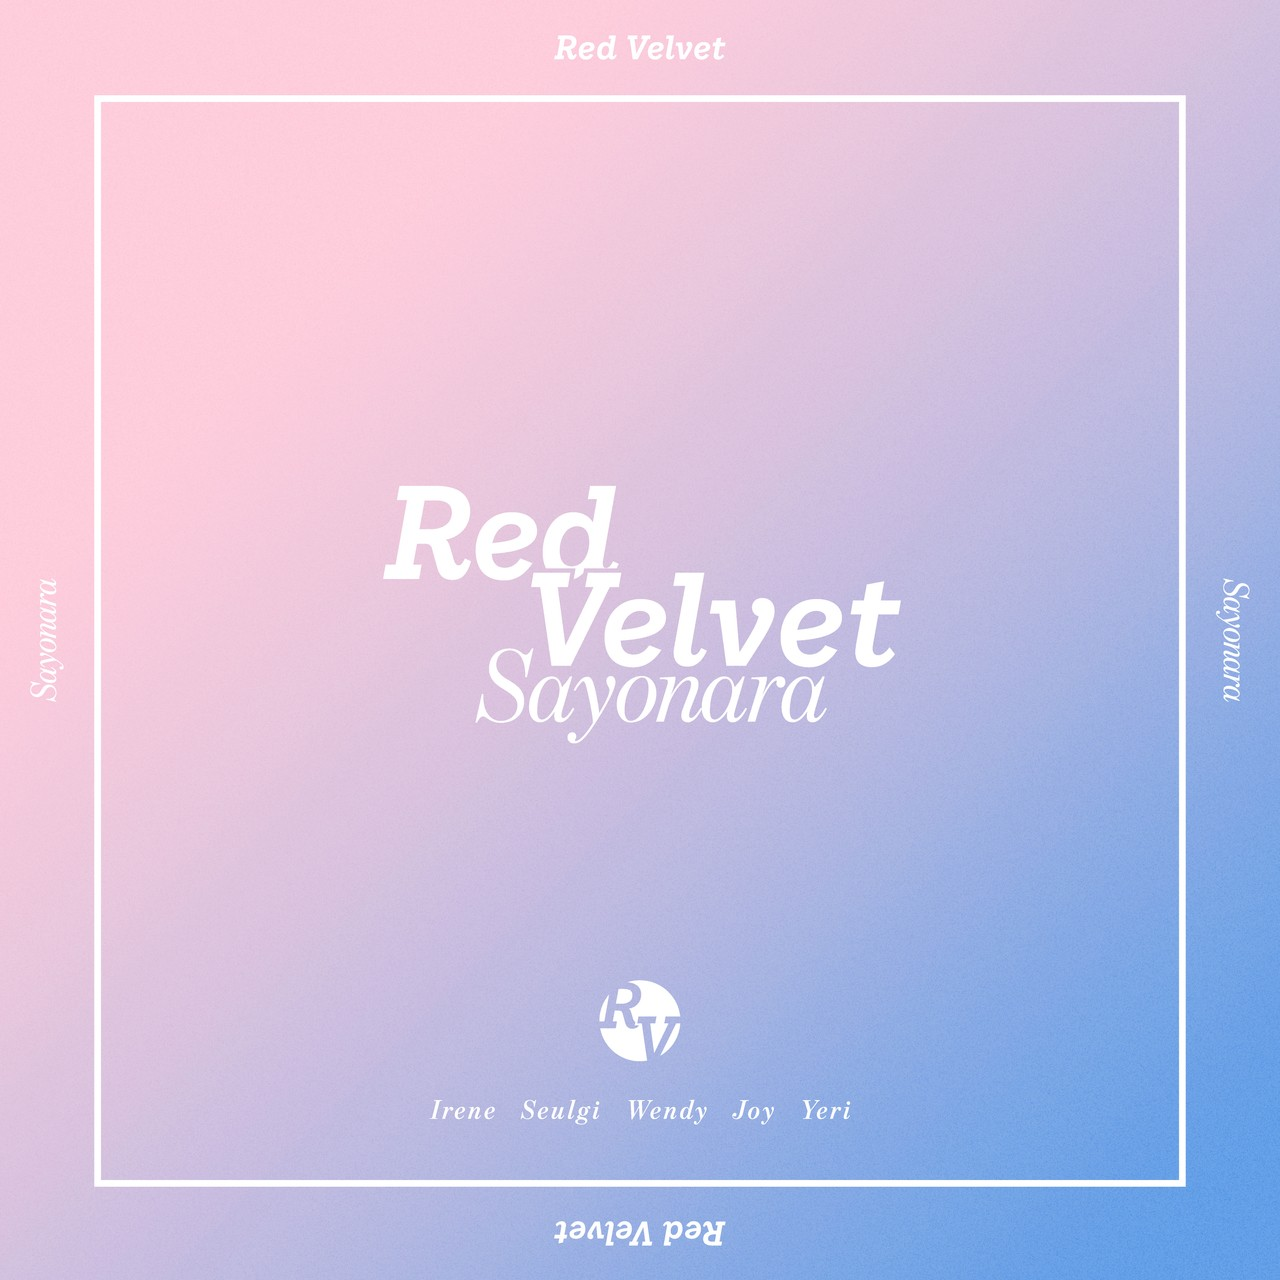 Red Velvet (레드벨벳) – Sayonara [AAC 320 / WEB] [2019.02.20]